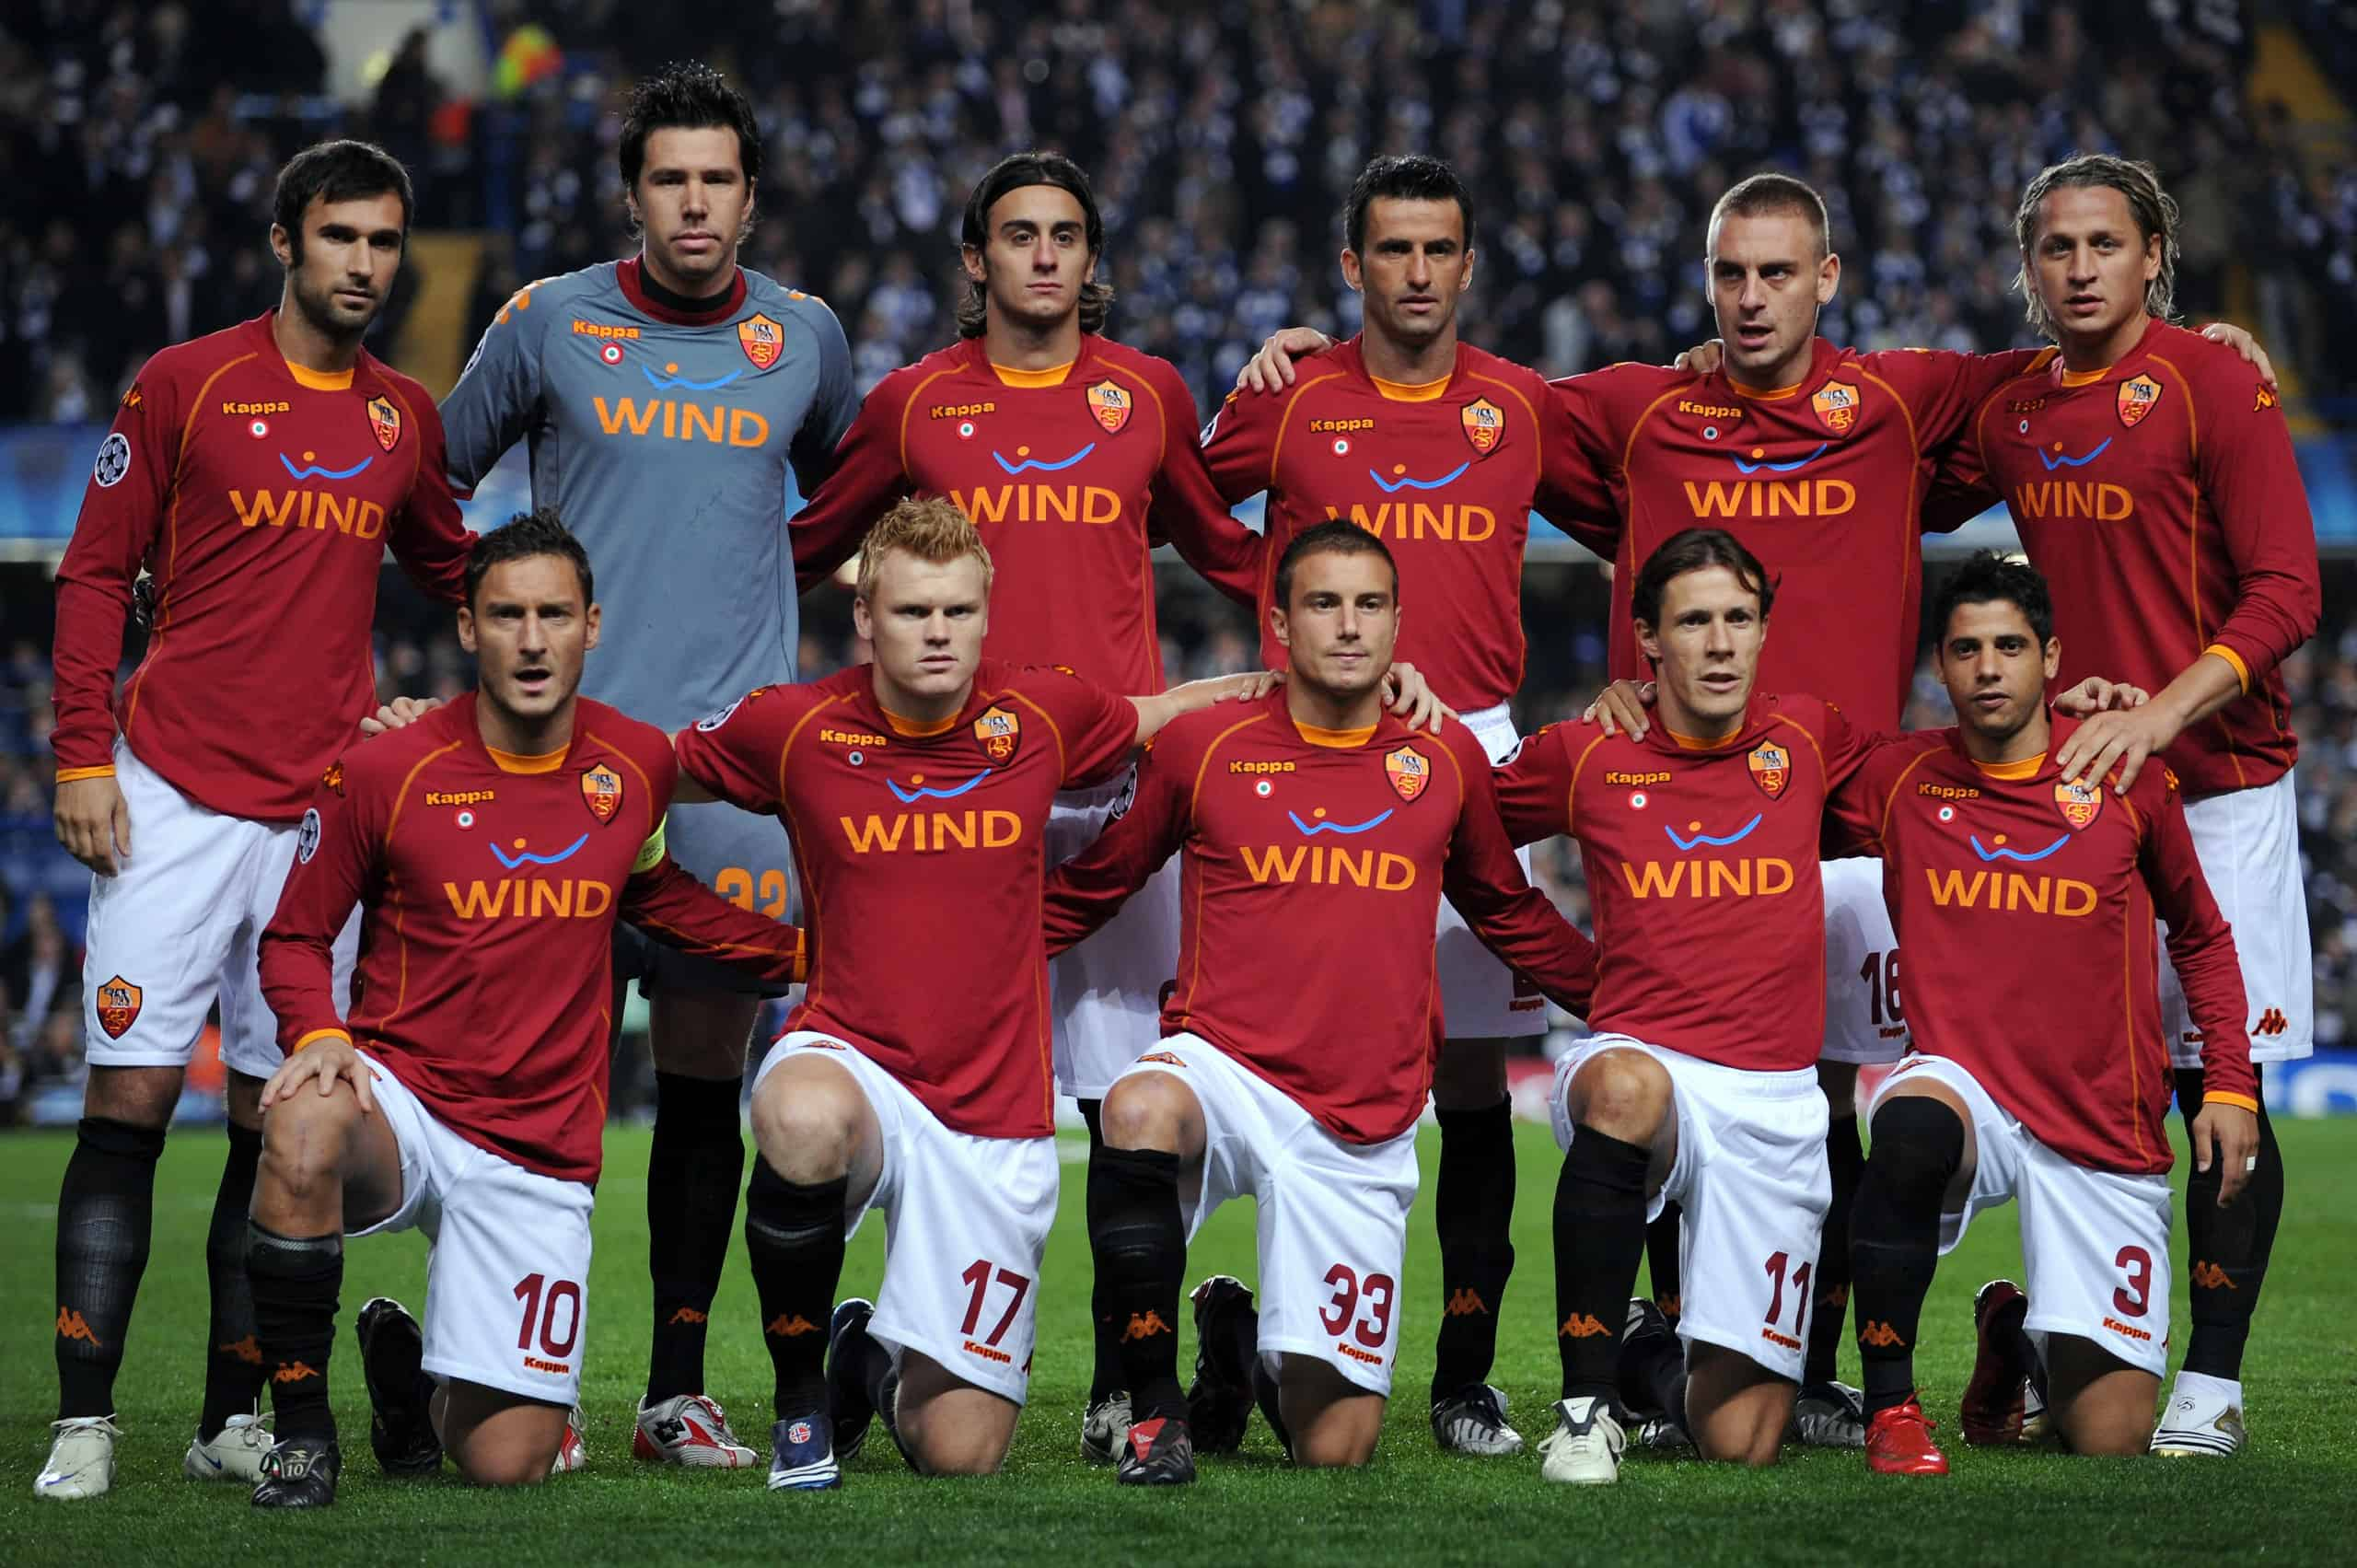 Roma soccer team